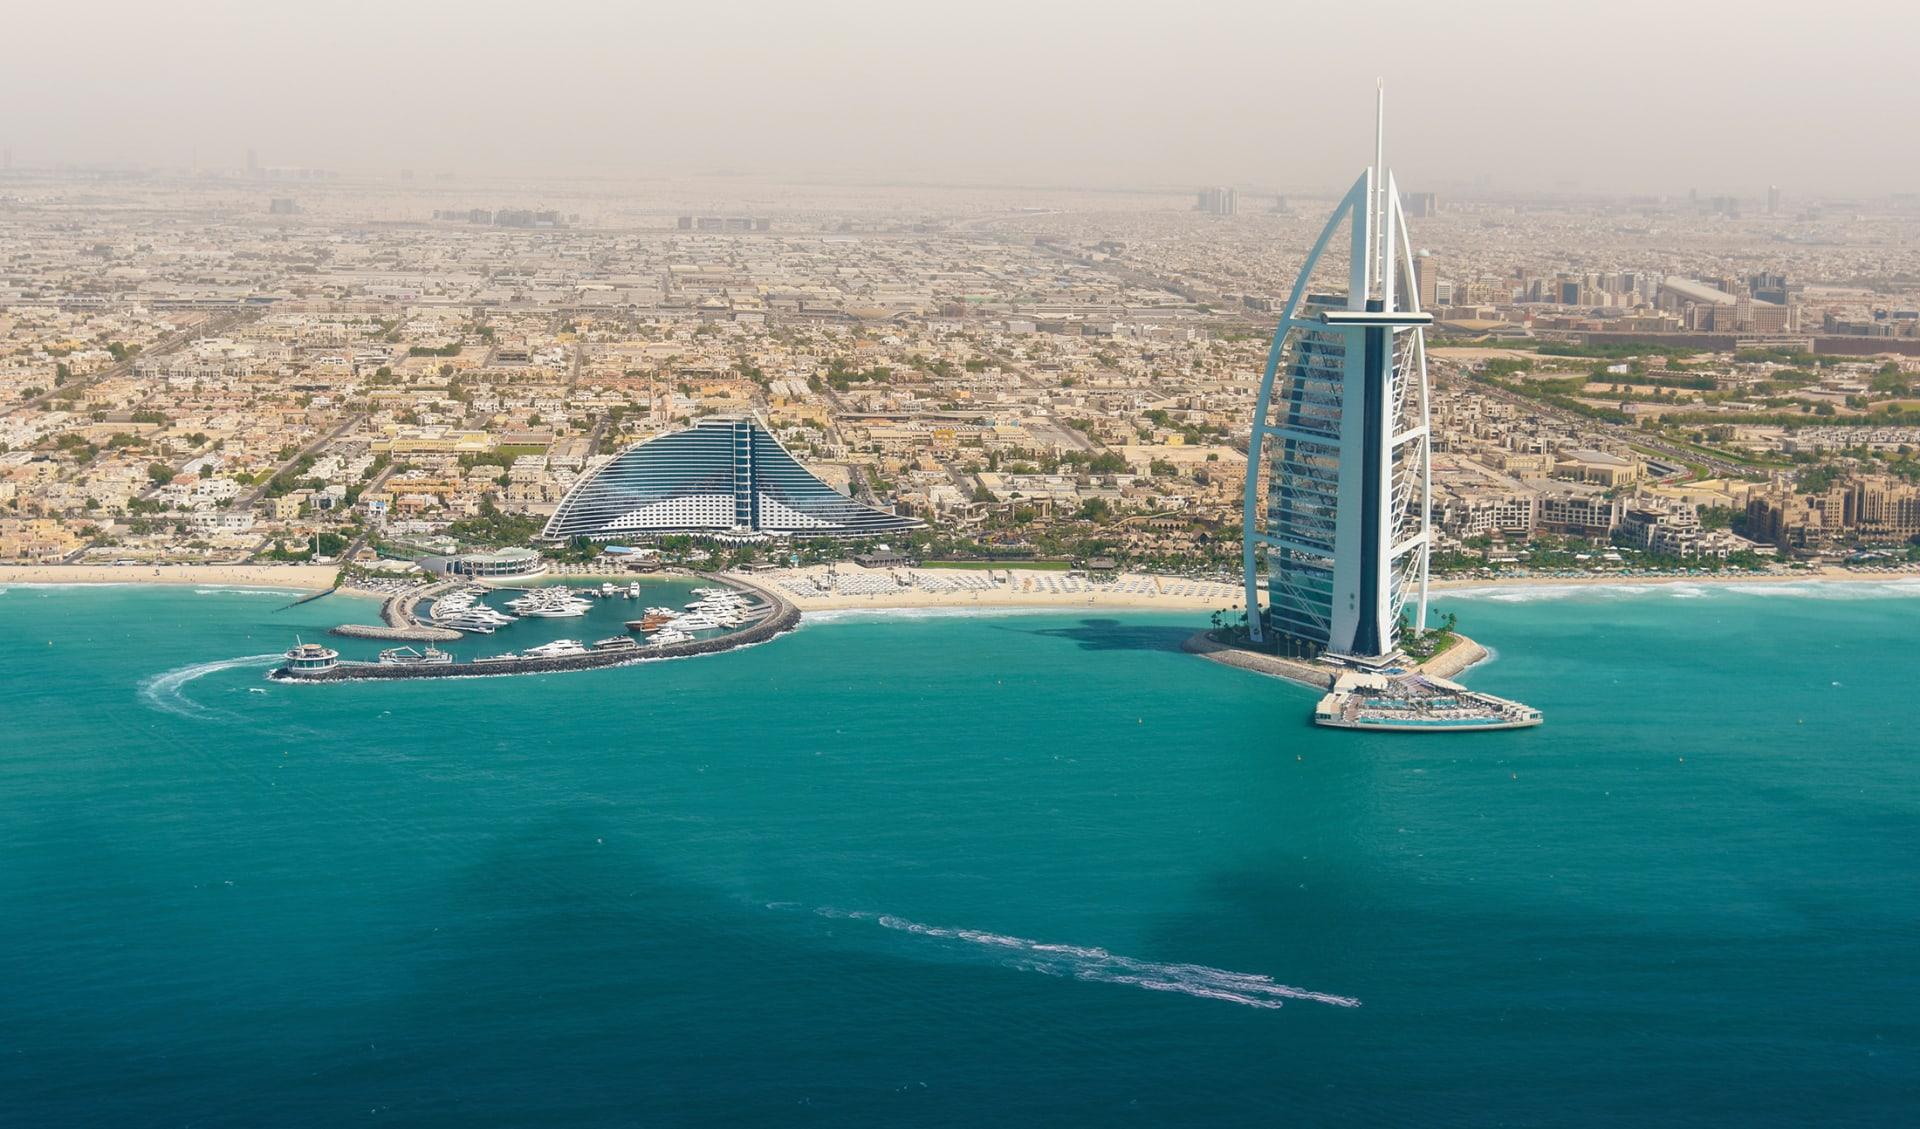 Strand skyline, Dubai